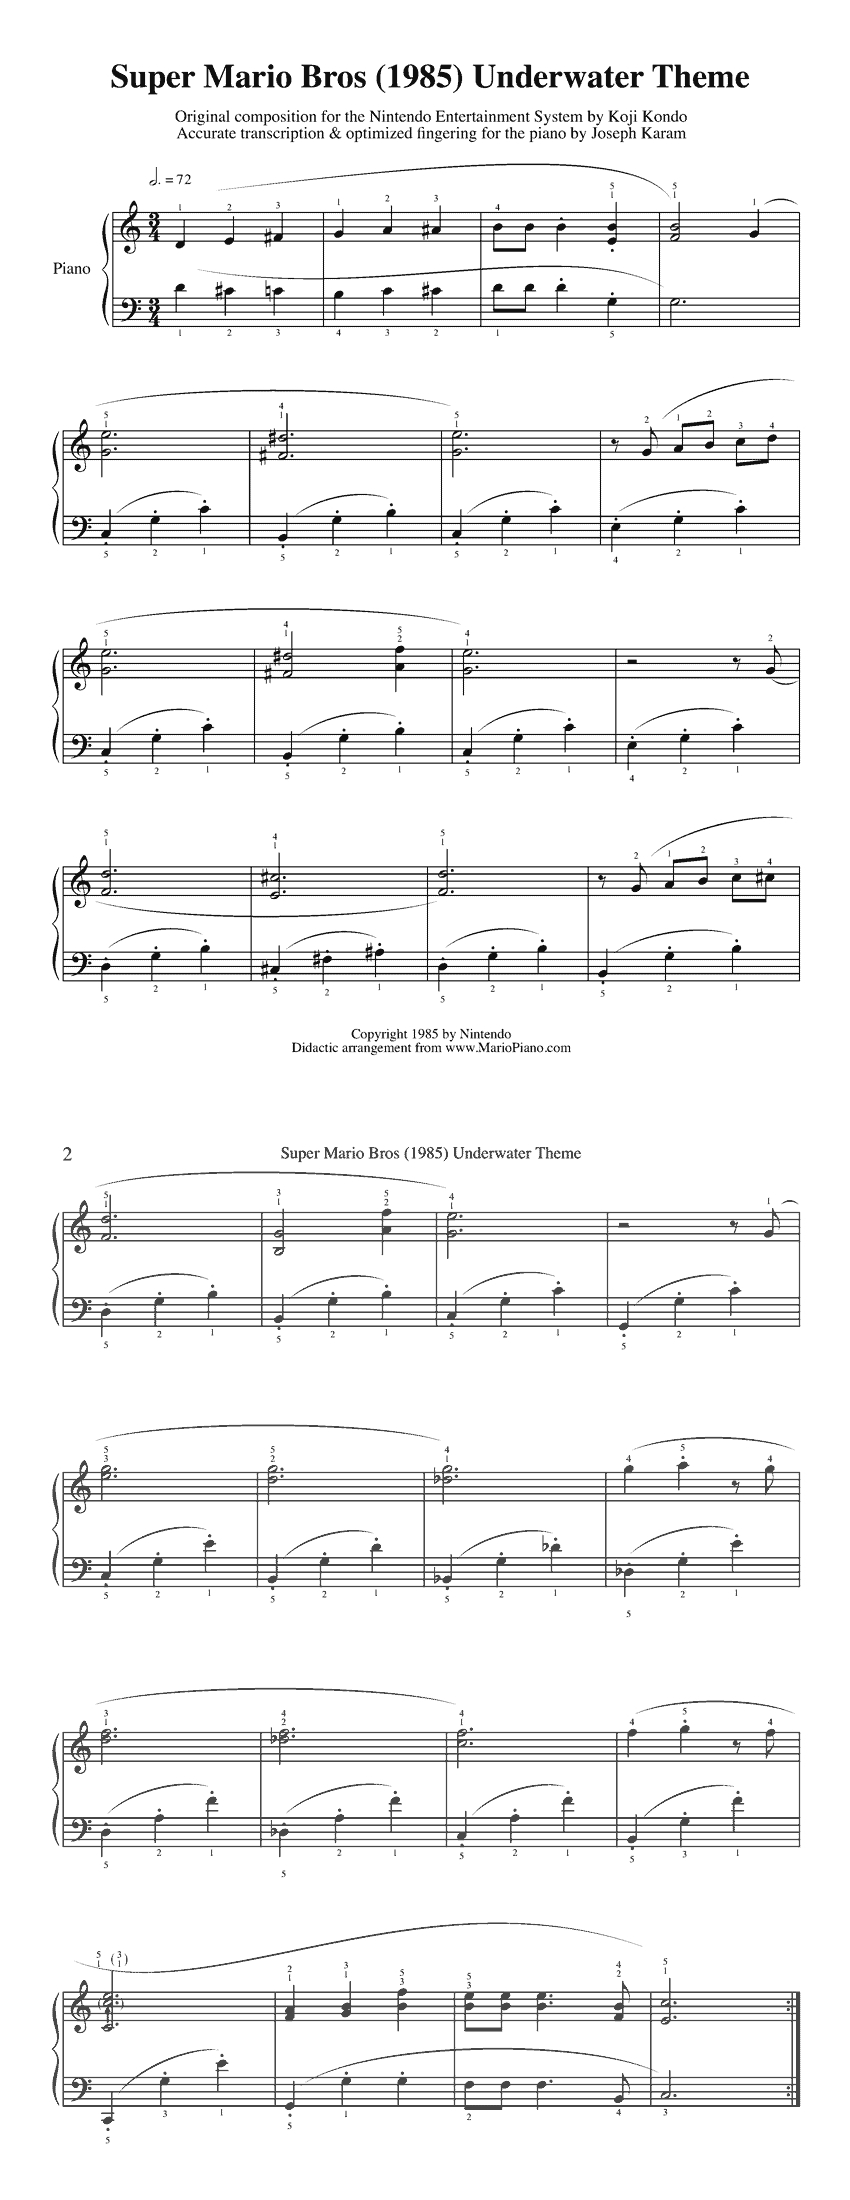 Super Mario Sheet Music | Zeldapalooza | Music, Clarinet Sheet Music - Free Sheet Music For Clarinet Printable